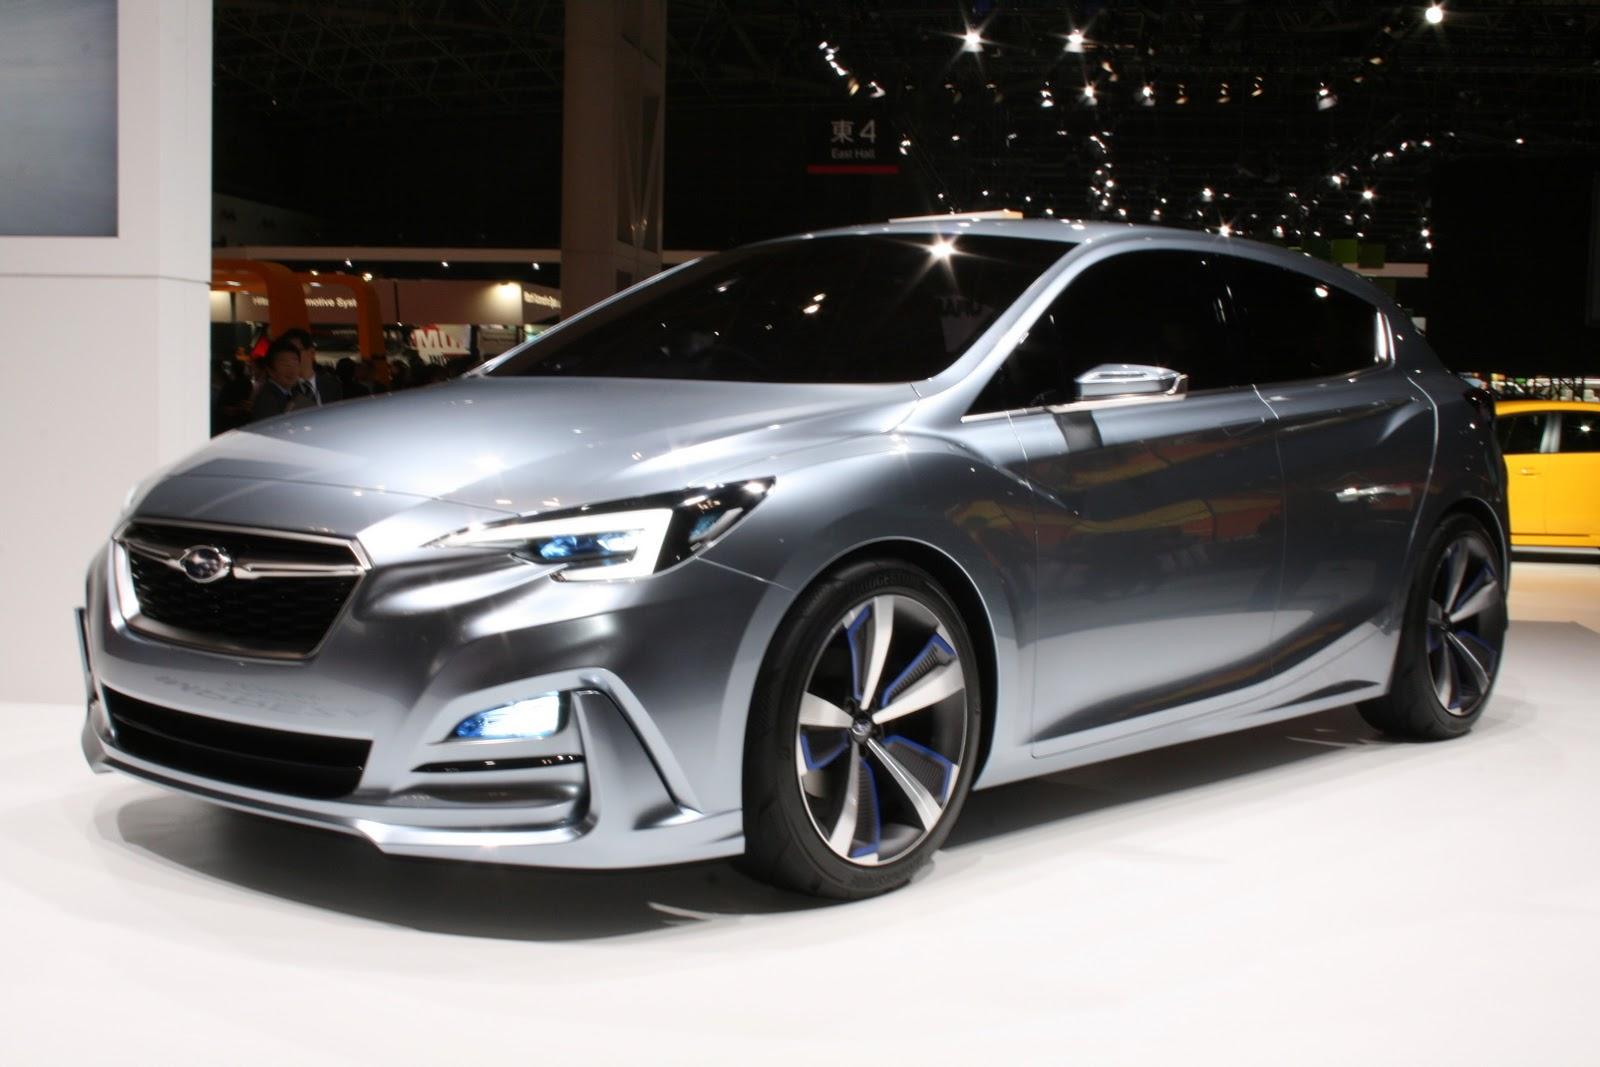 new subaru impreza sedan concept coming to la auto show carscoops. Black Bedroom Furniture Sets. Home Design Ideas